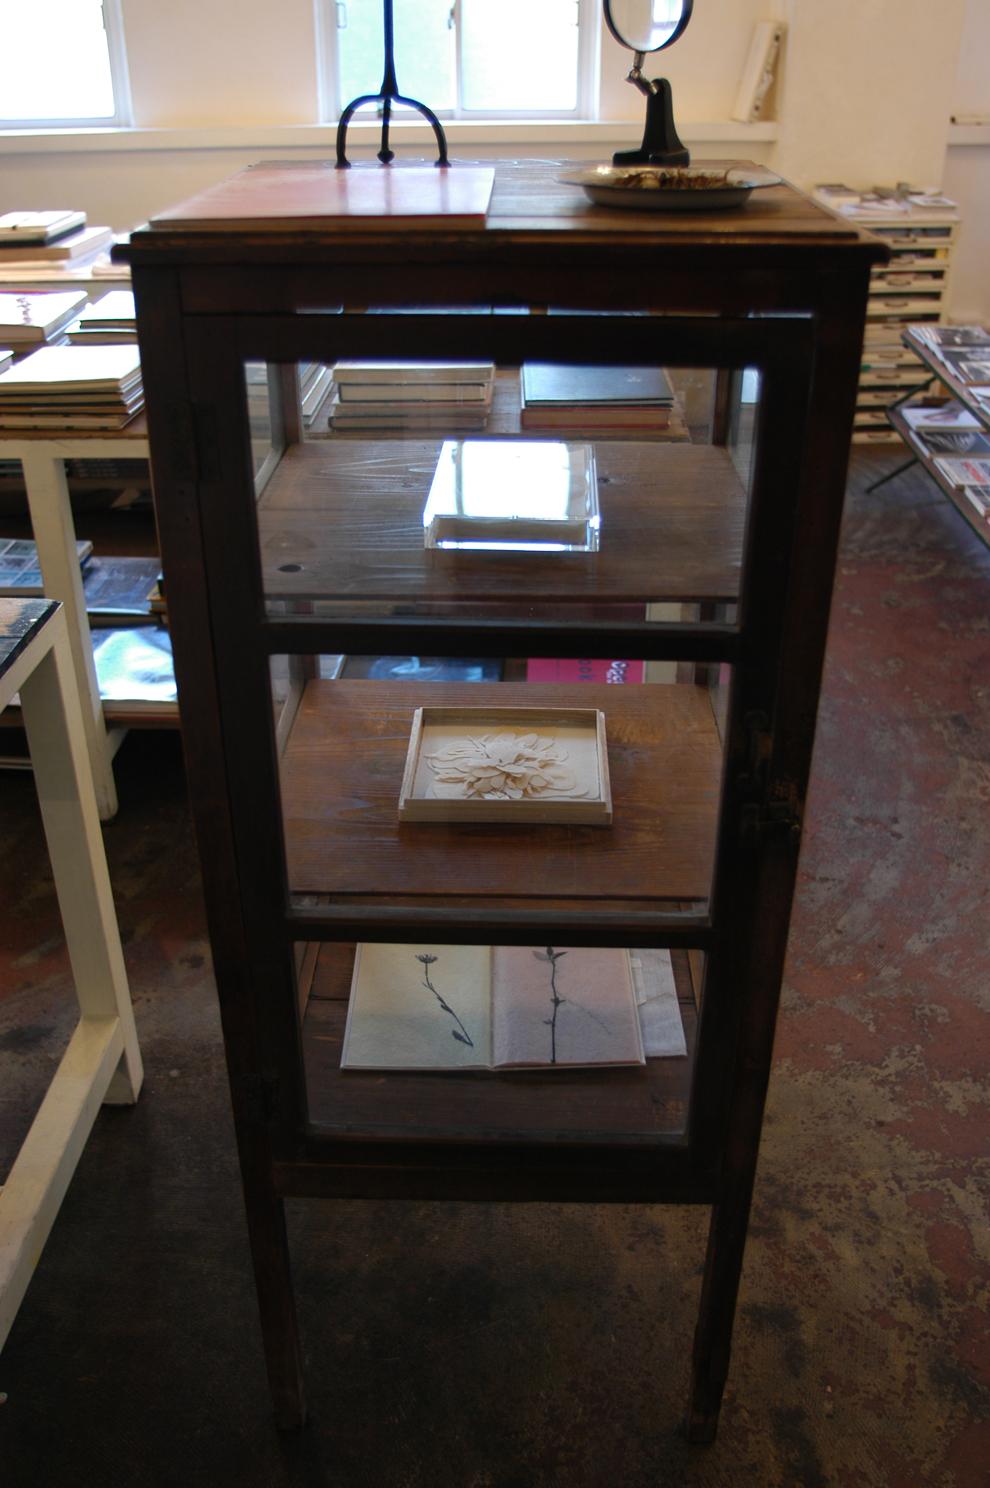 ADACHI Ryoko - book art, paper, display case